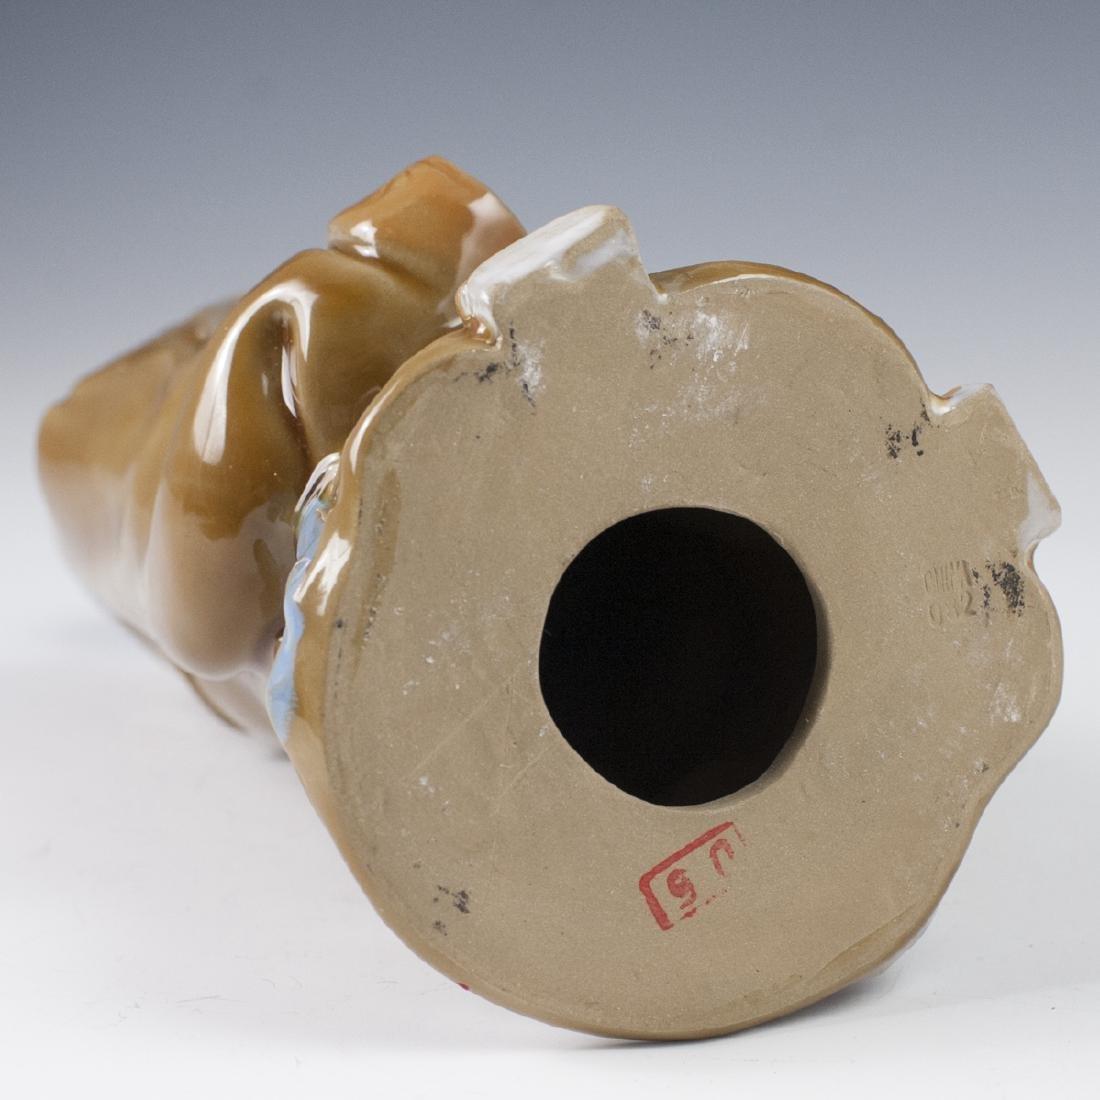 Chinese Glazed Ceramic Mudmen Figurines - 7